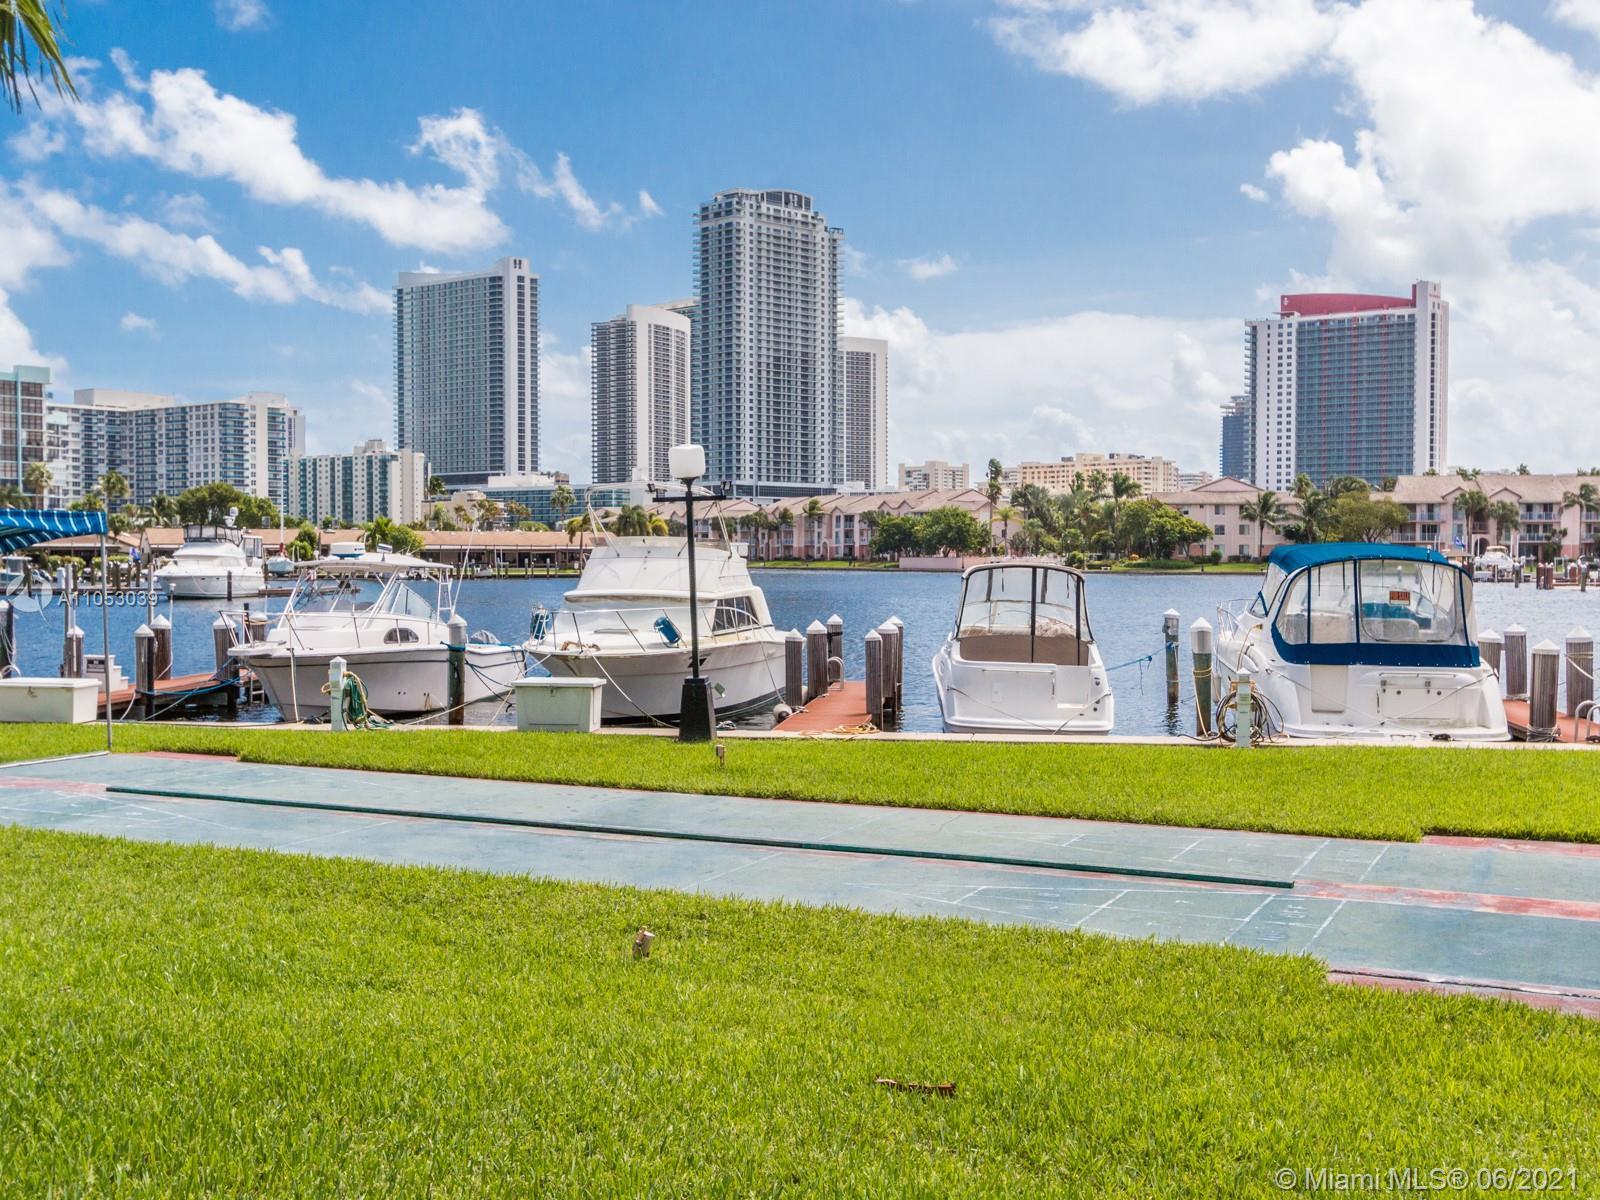 Photo of 600 Three Islands Blvd #312, Hallandale Beach, Florida, 33009 - MARINA POOL DECK